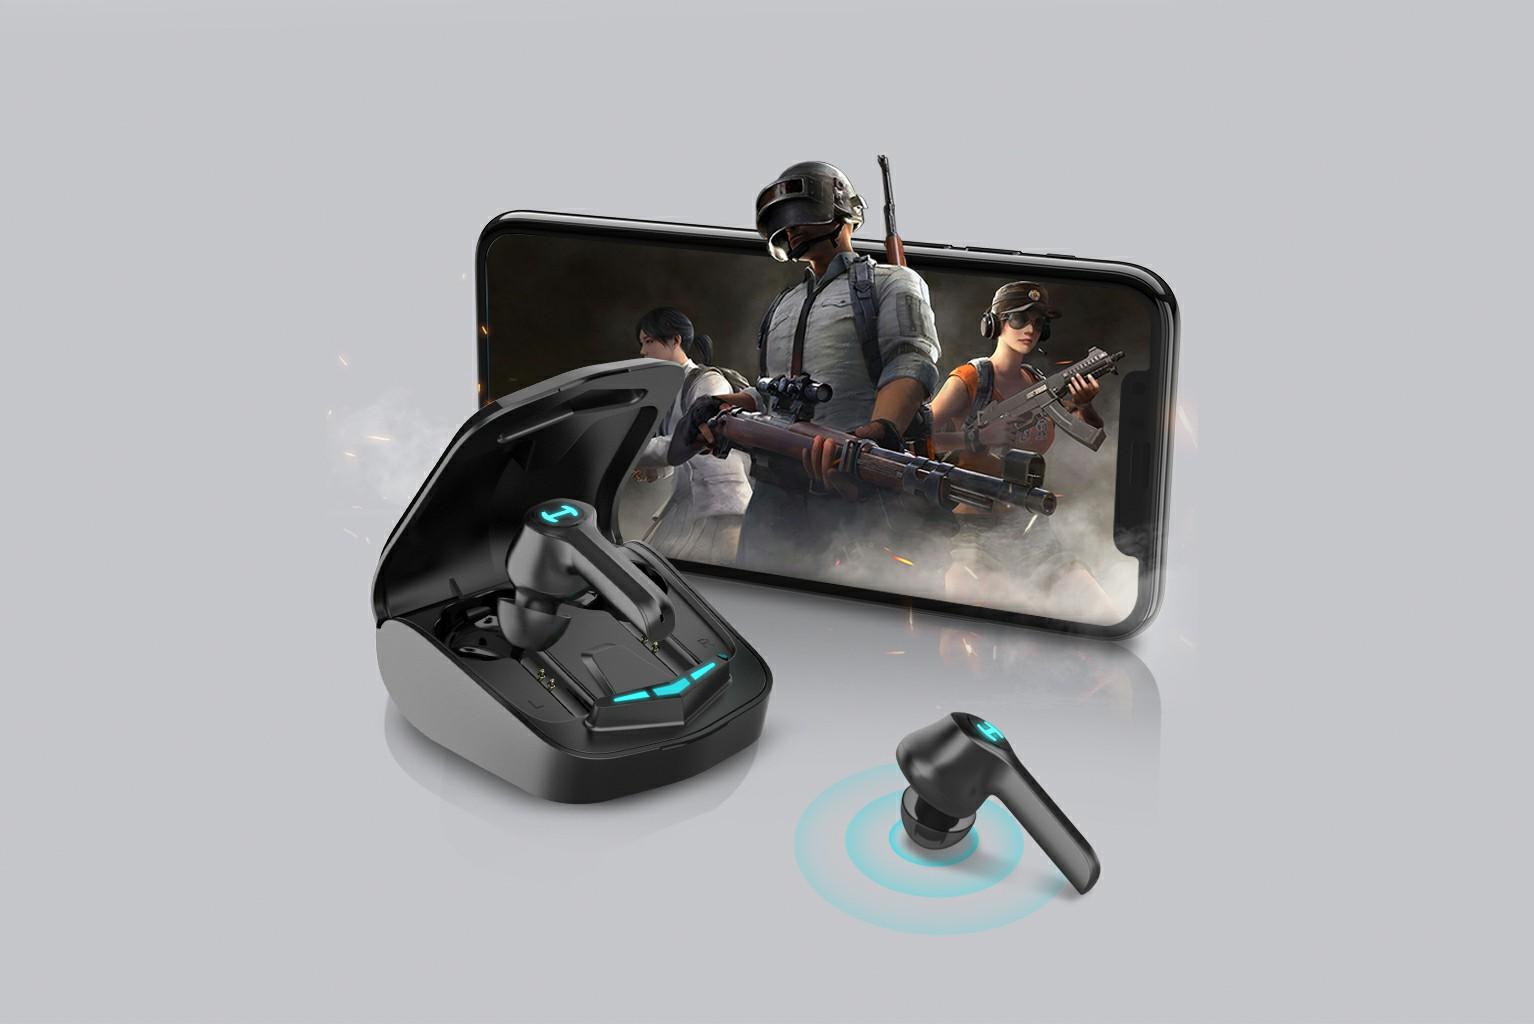 True Wireless Gaming Earbuds